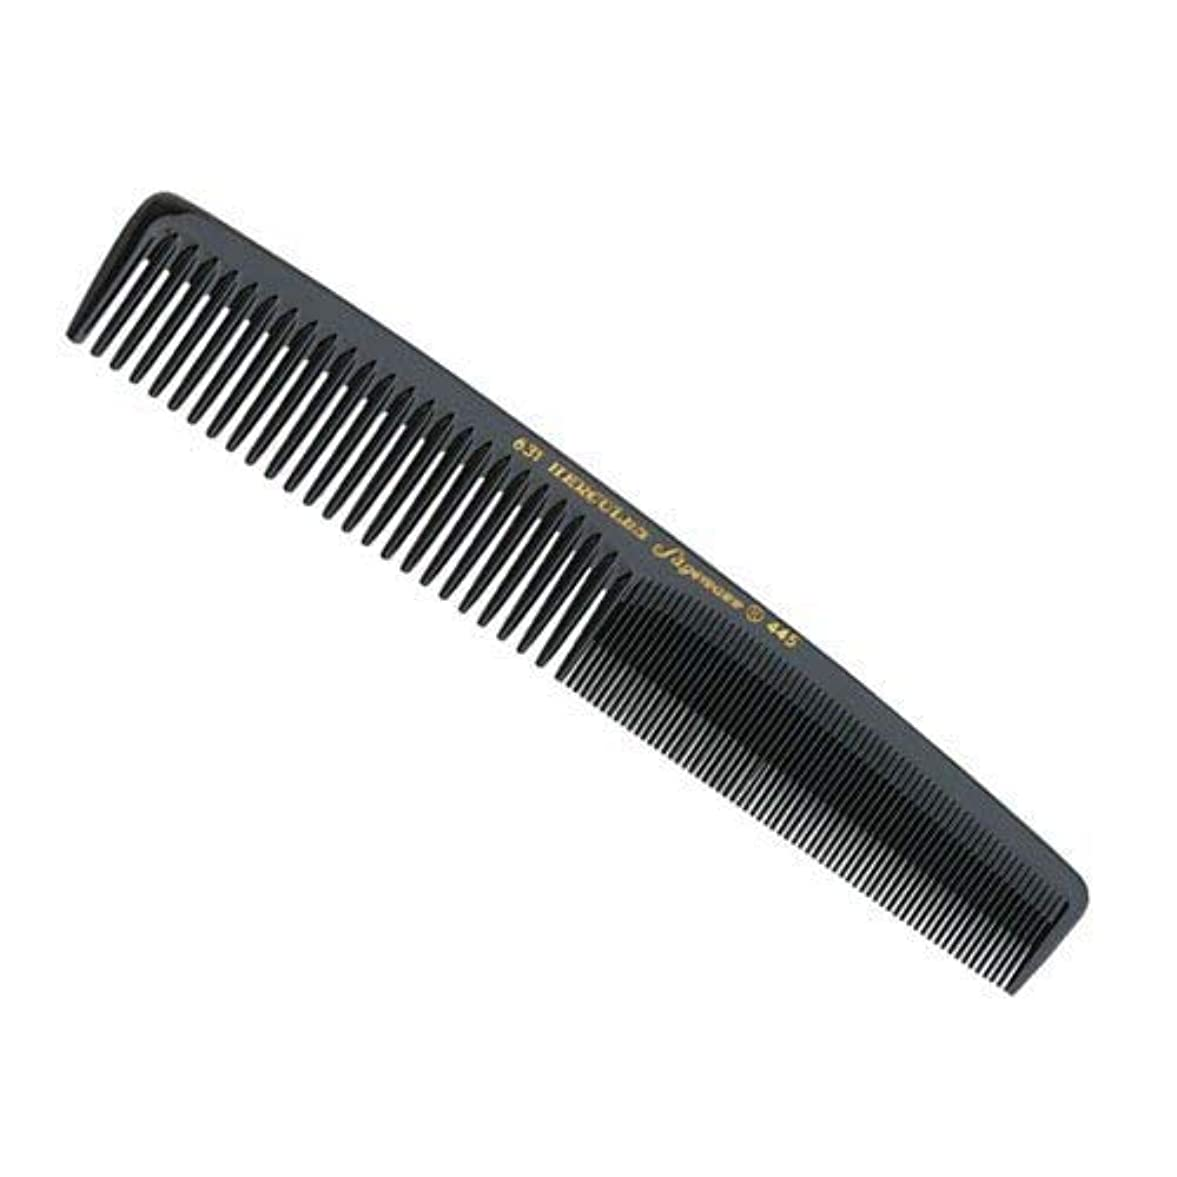 パーツ瀬戸際消化Hercules Sagemann Medium Waver Ladies Hair Comb, Length-17.8 cm [並行輸入品]